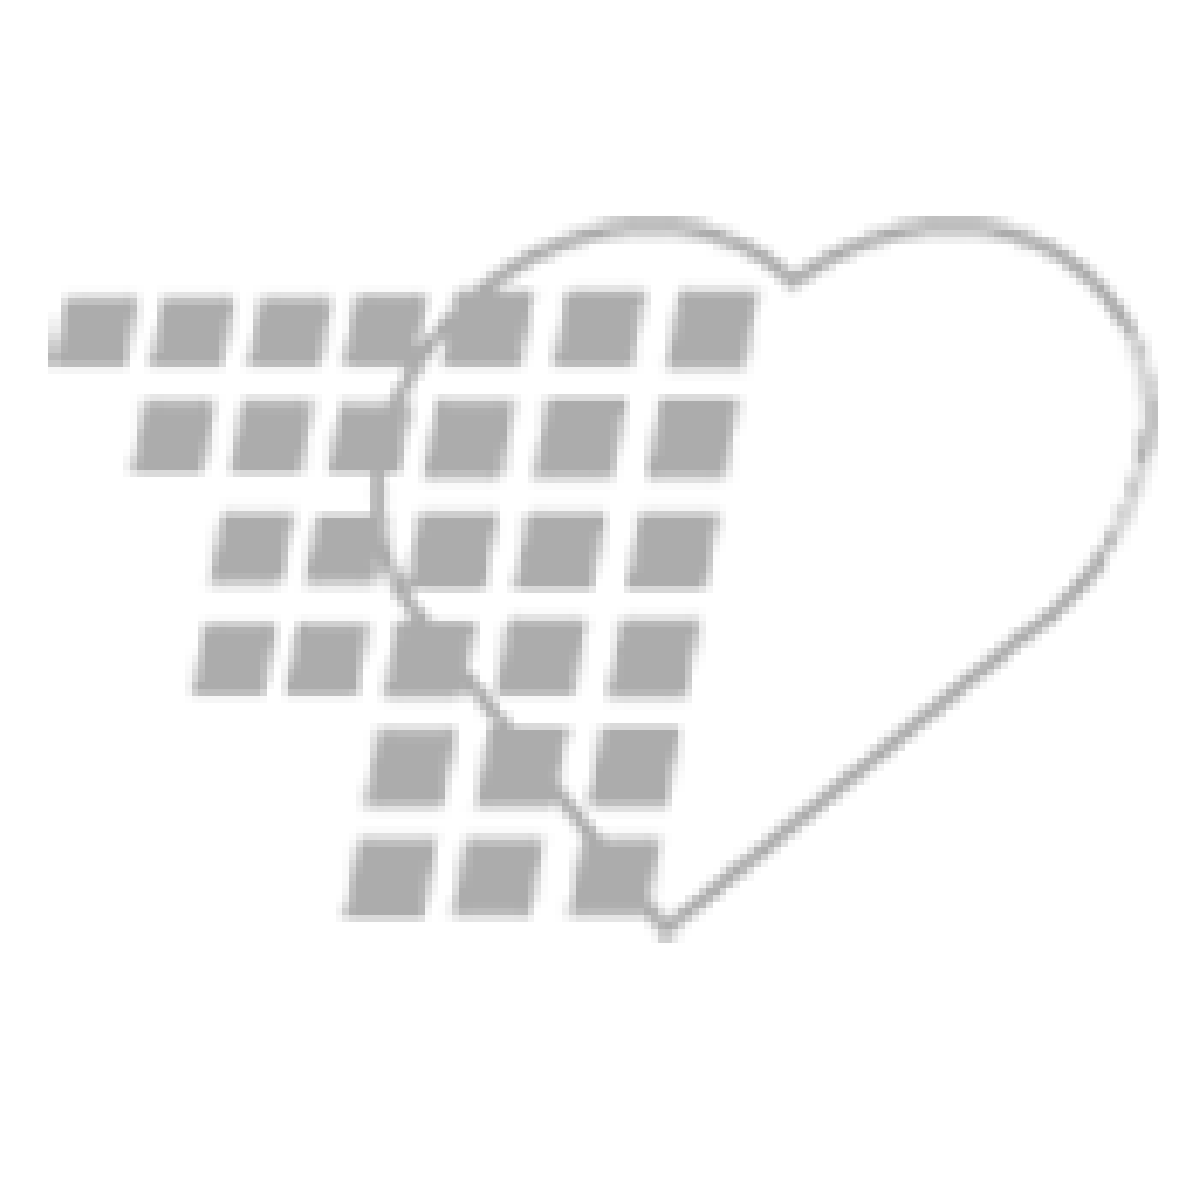 05-49-6197 Salem Sump™ Anti-Reflux Valve